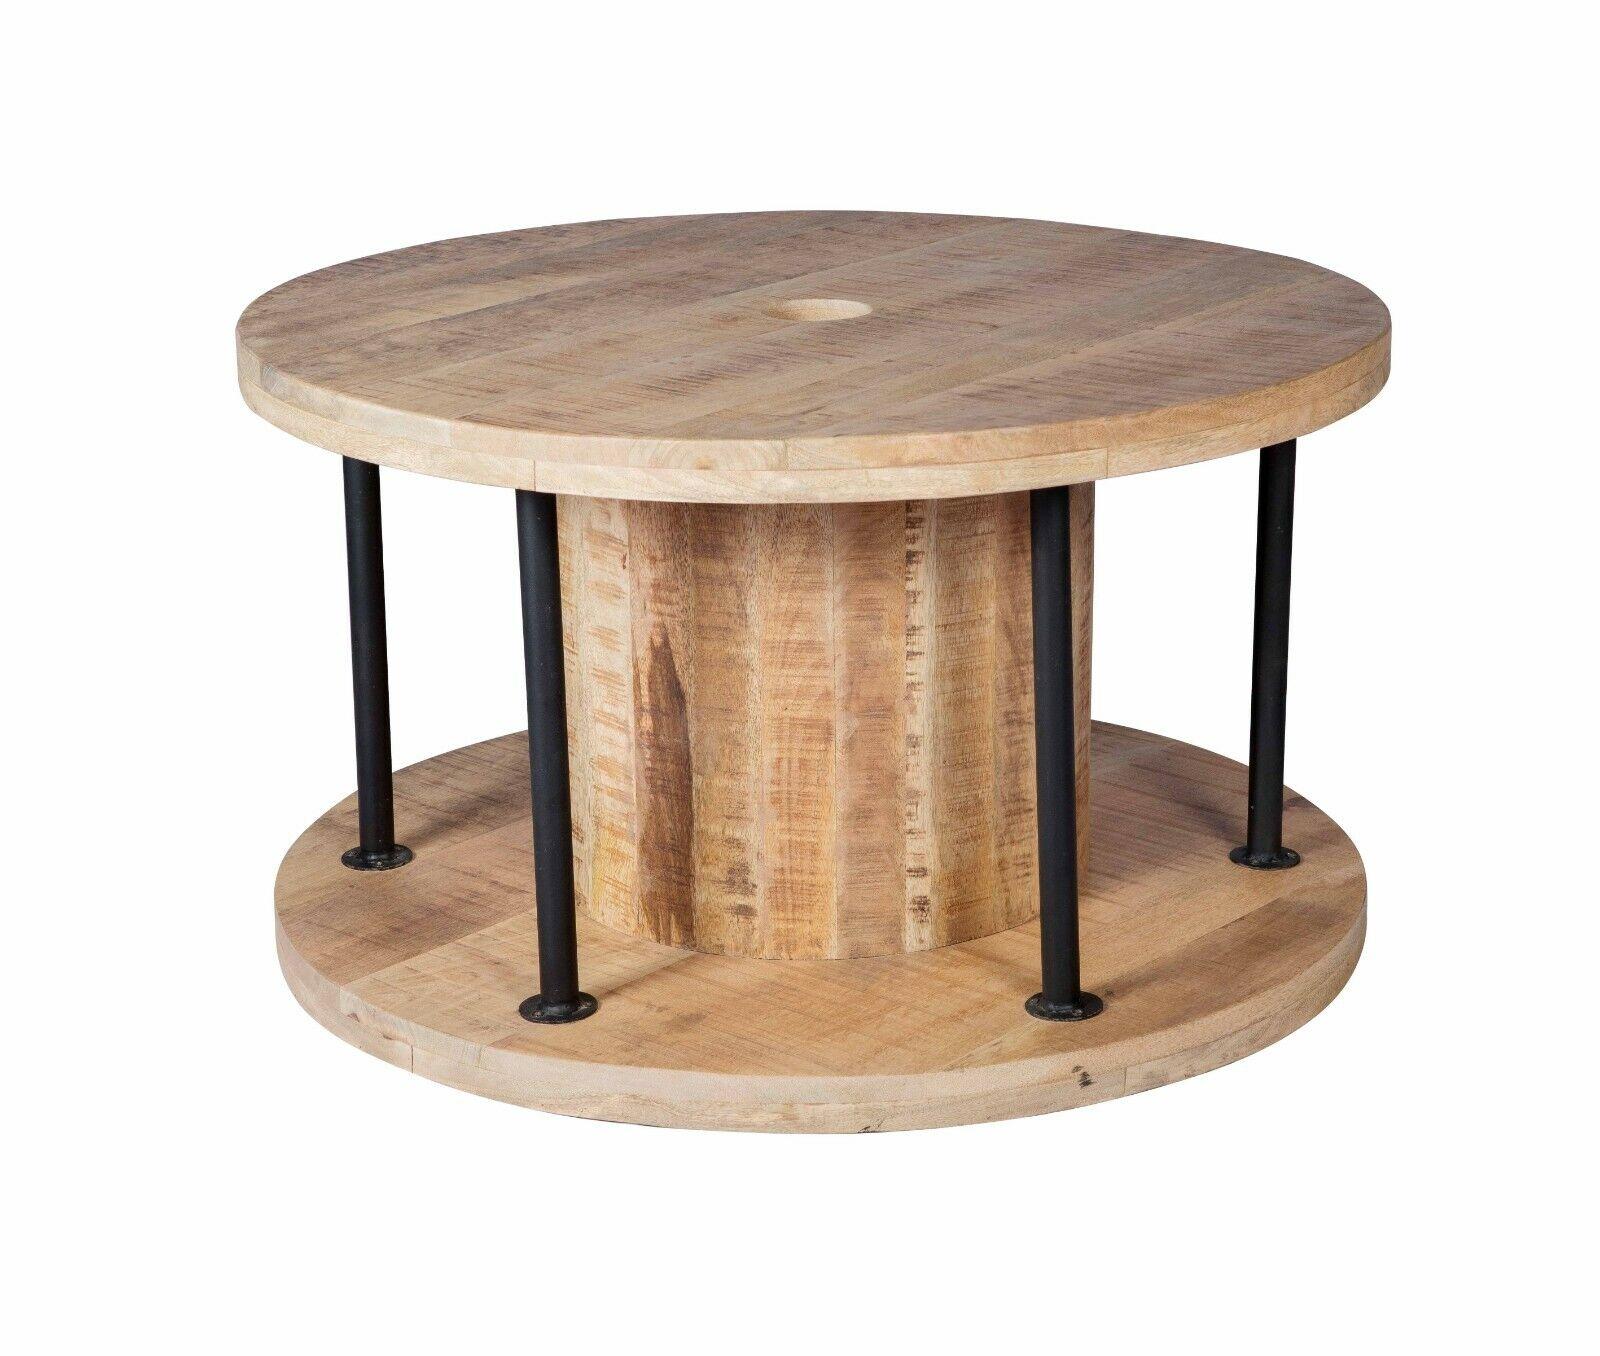 Modern Industrial Look Coffee Table Round Shape Lining Room Furniture Solid Wood 5051132949878 Ebay